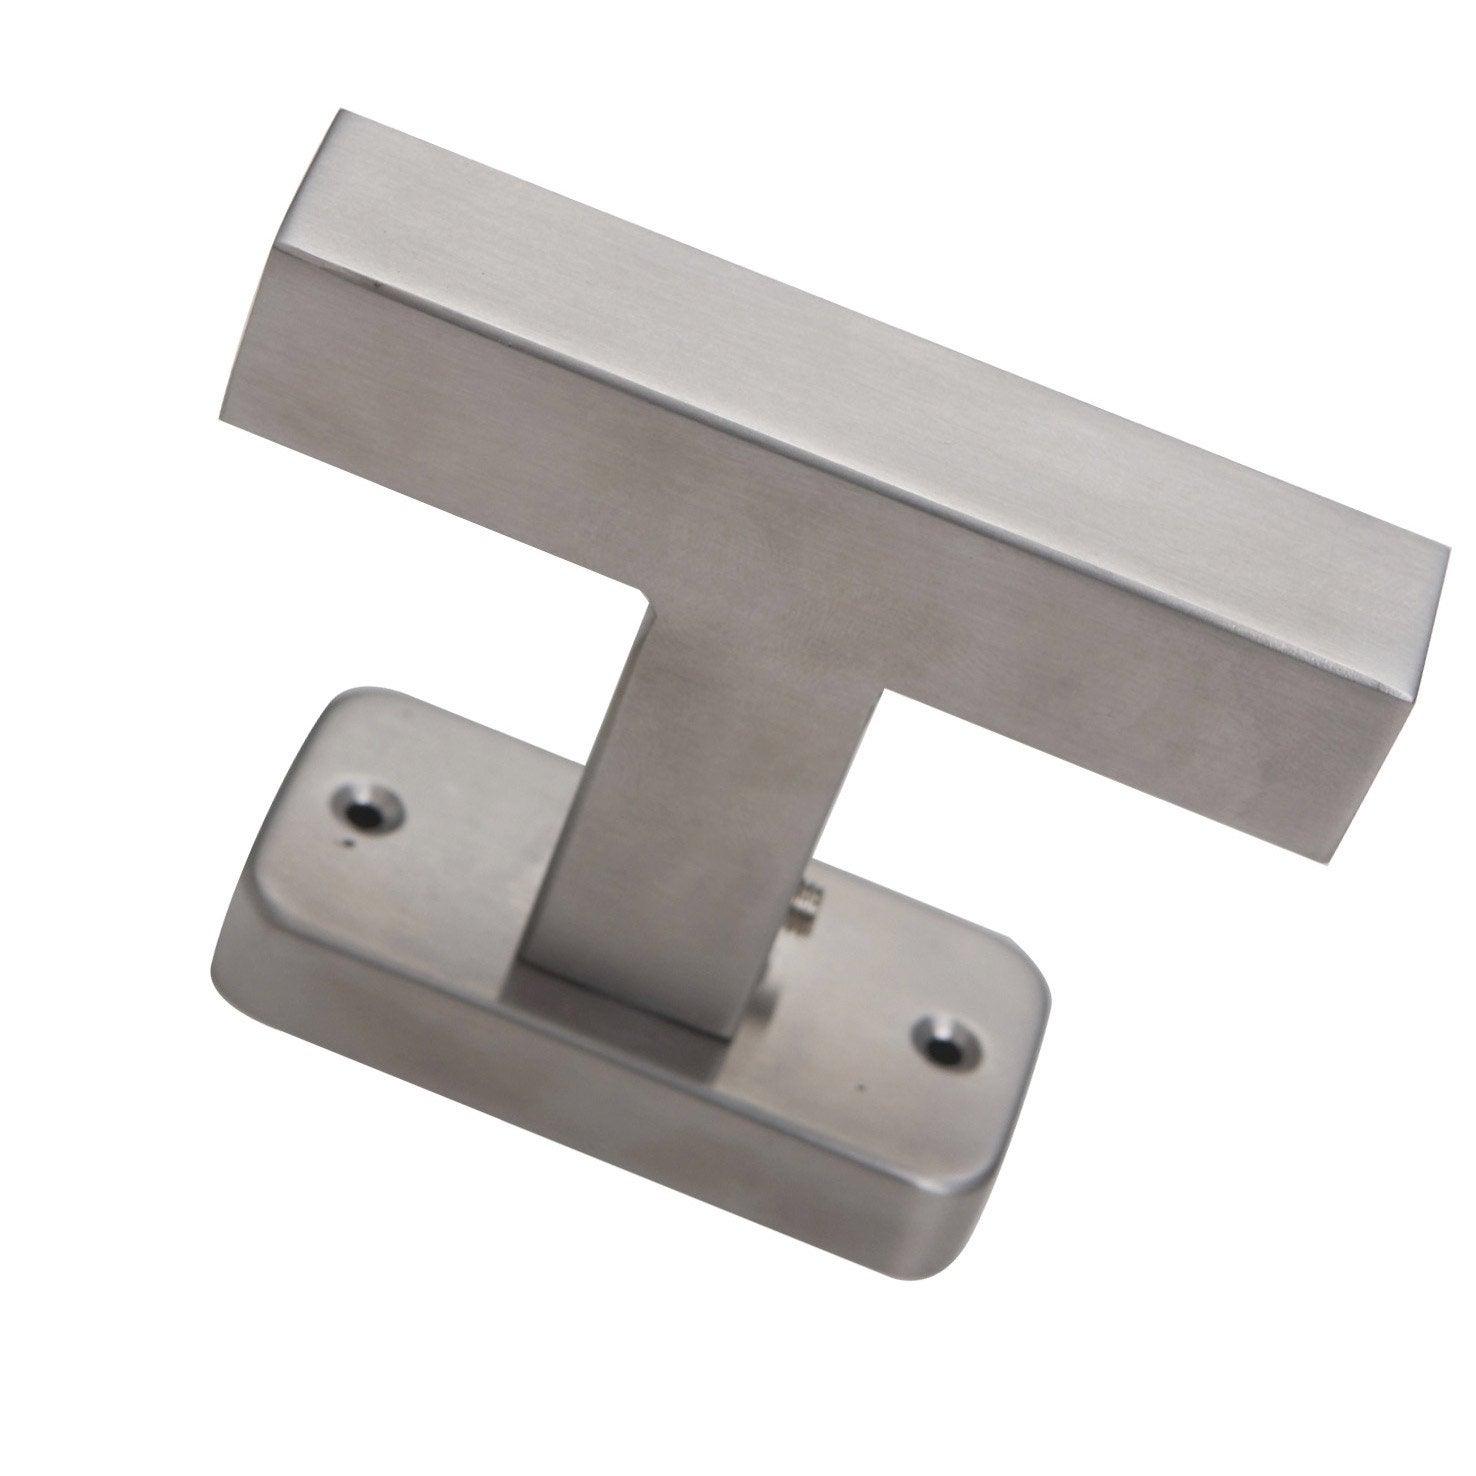 Cr mone cube acier inoxydable bross leroy merlin for Cube leroy merlin